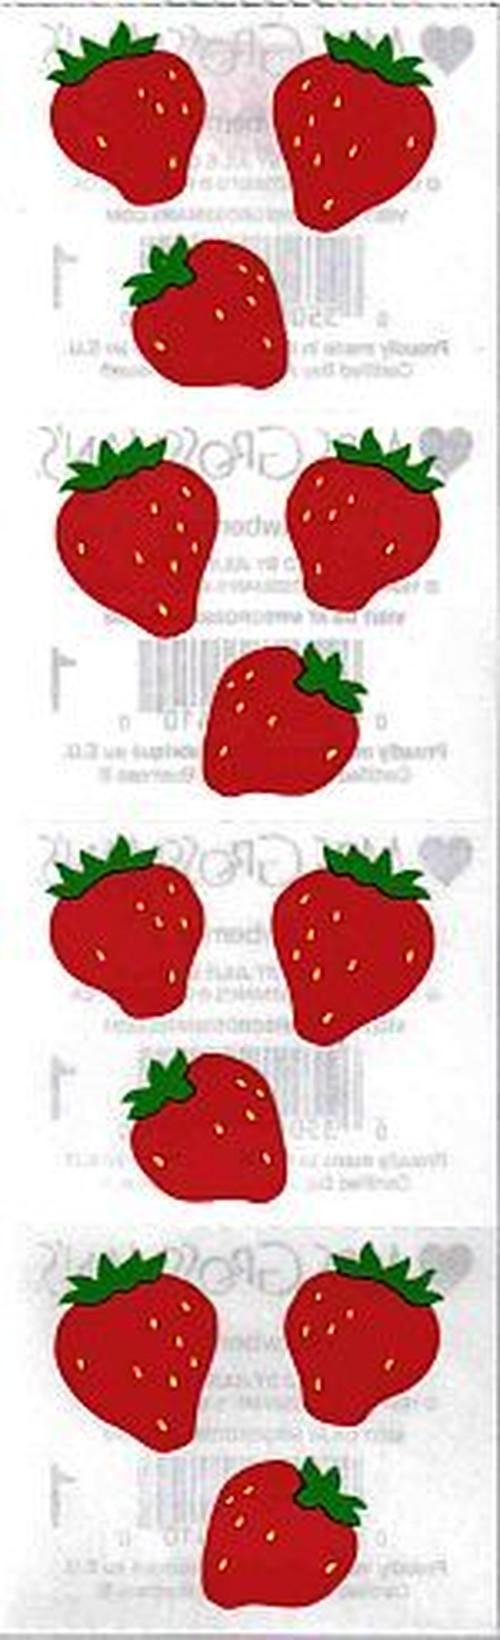 Strawberries, small